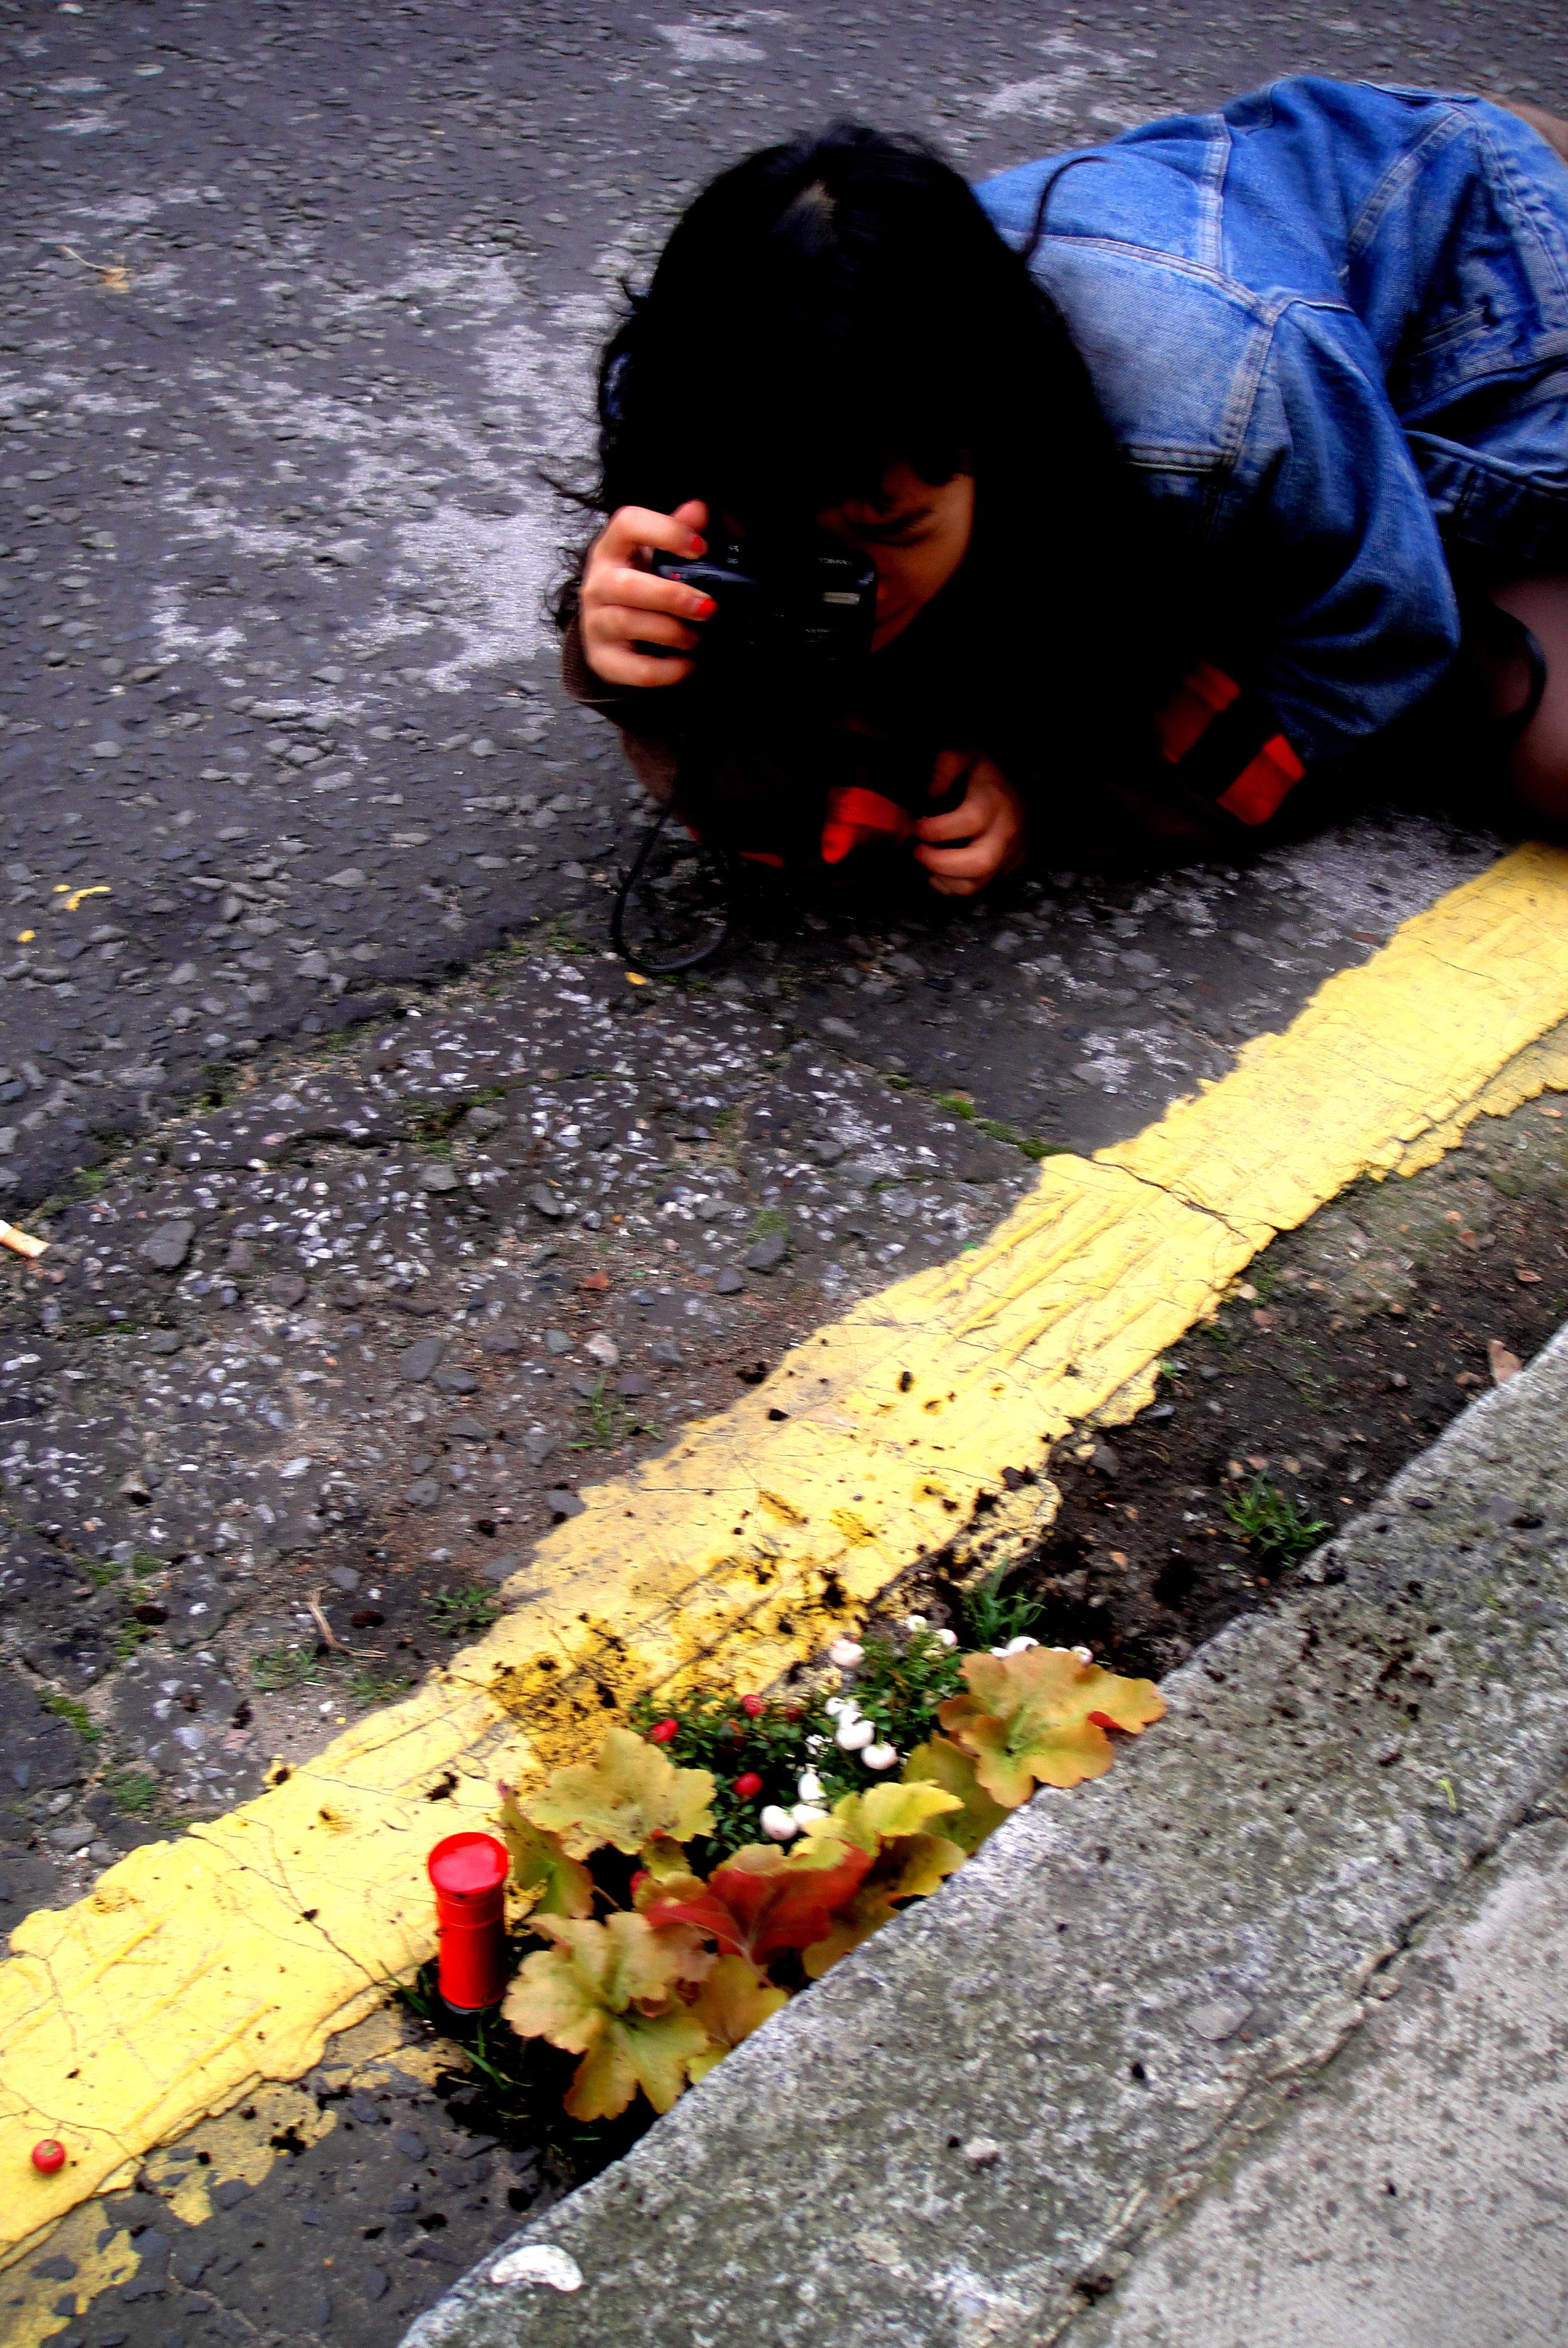 pothole-garden-royal-post-post-box-east-london-zing.jpg